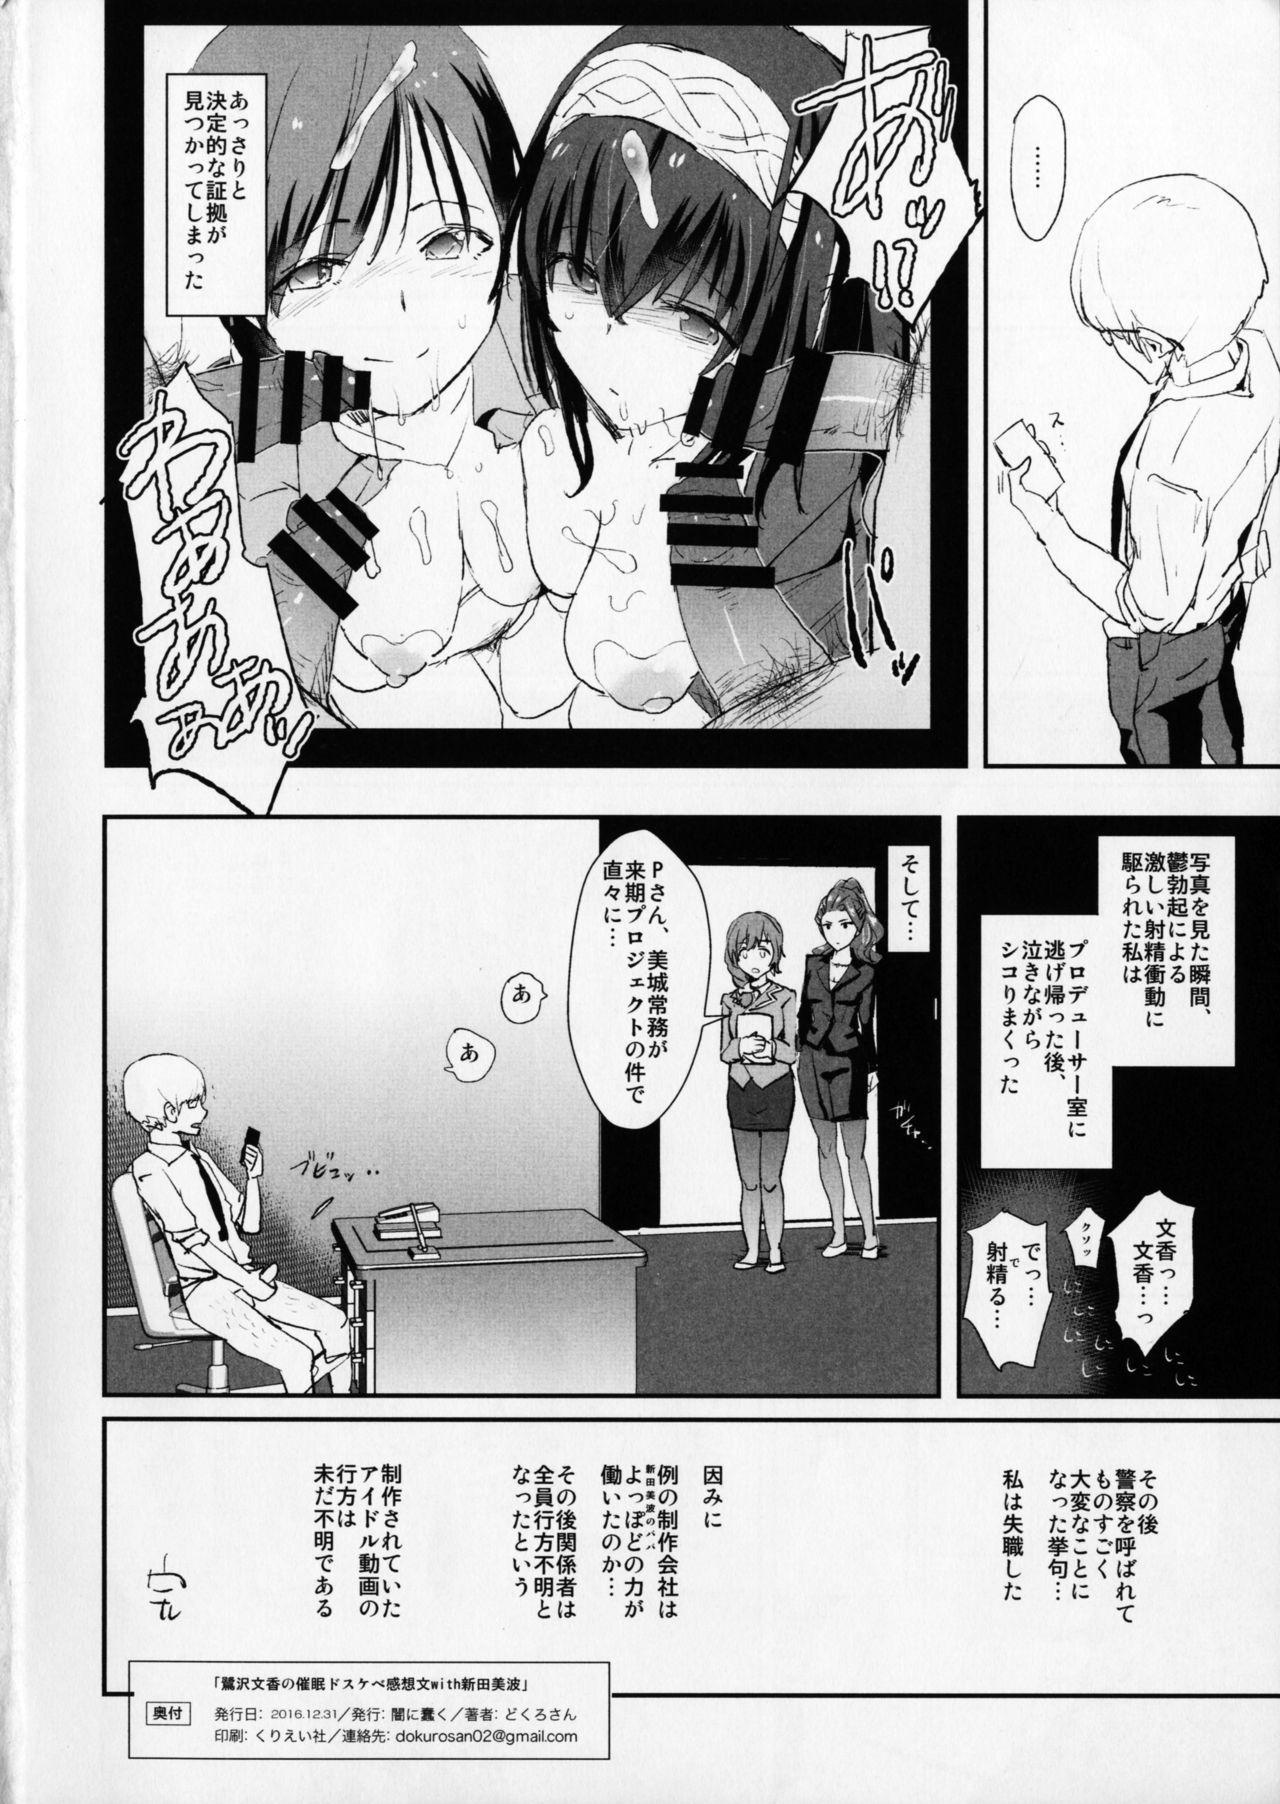 (C91) [Yami ni Ugomeku (Dokurosan)] Sagisawa Fumika no Saimin Dosukebe Kansoubun (with Nitta Minami) + Omake Paper (THE IDOLM@STER CINDERELLA GIRLS) 22